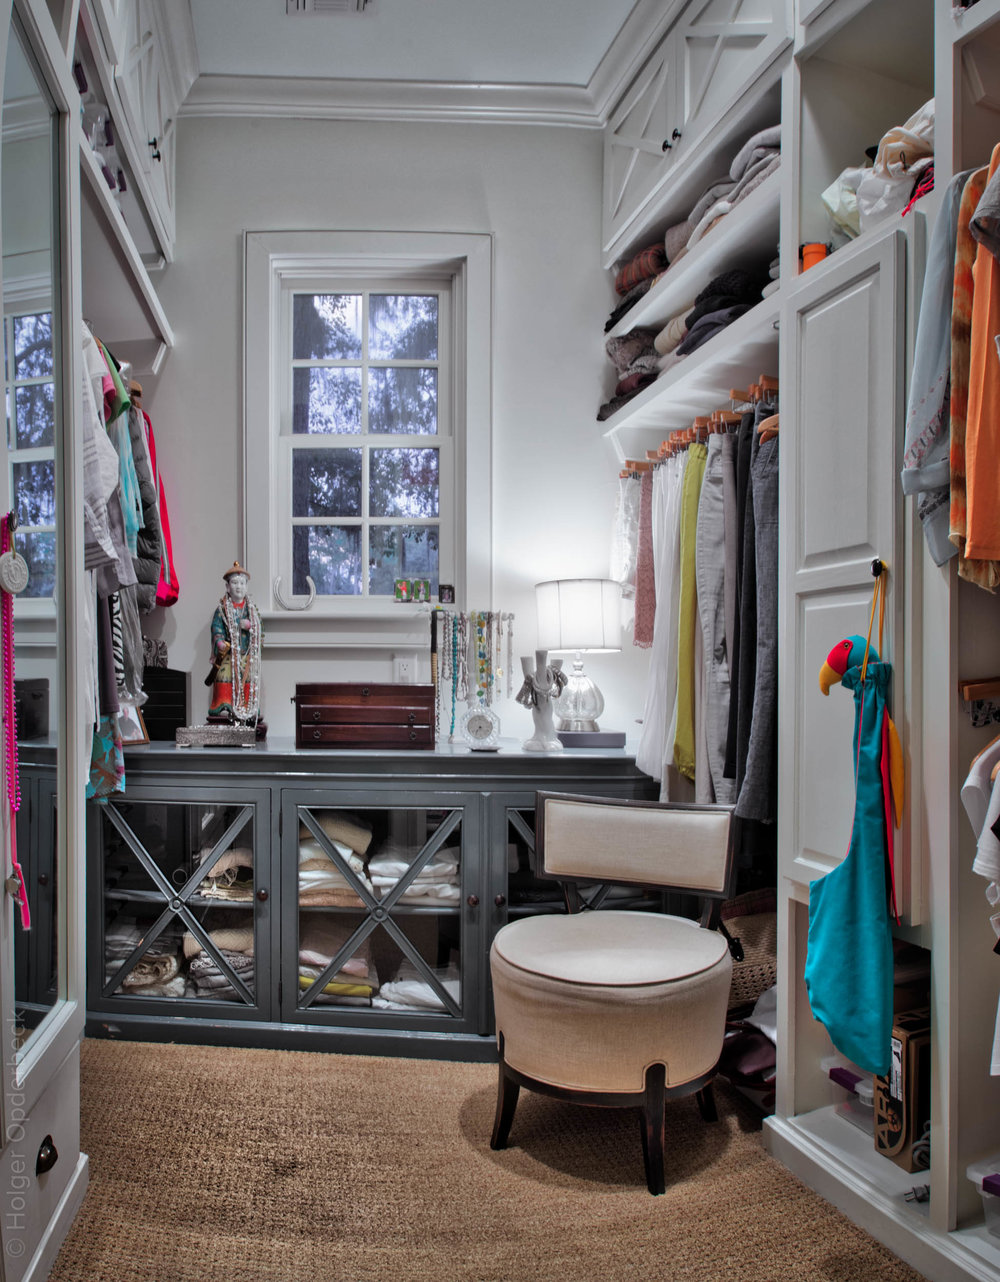 355 walk-in-closet.jpg